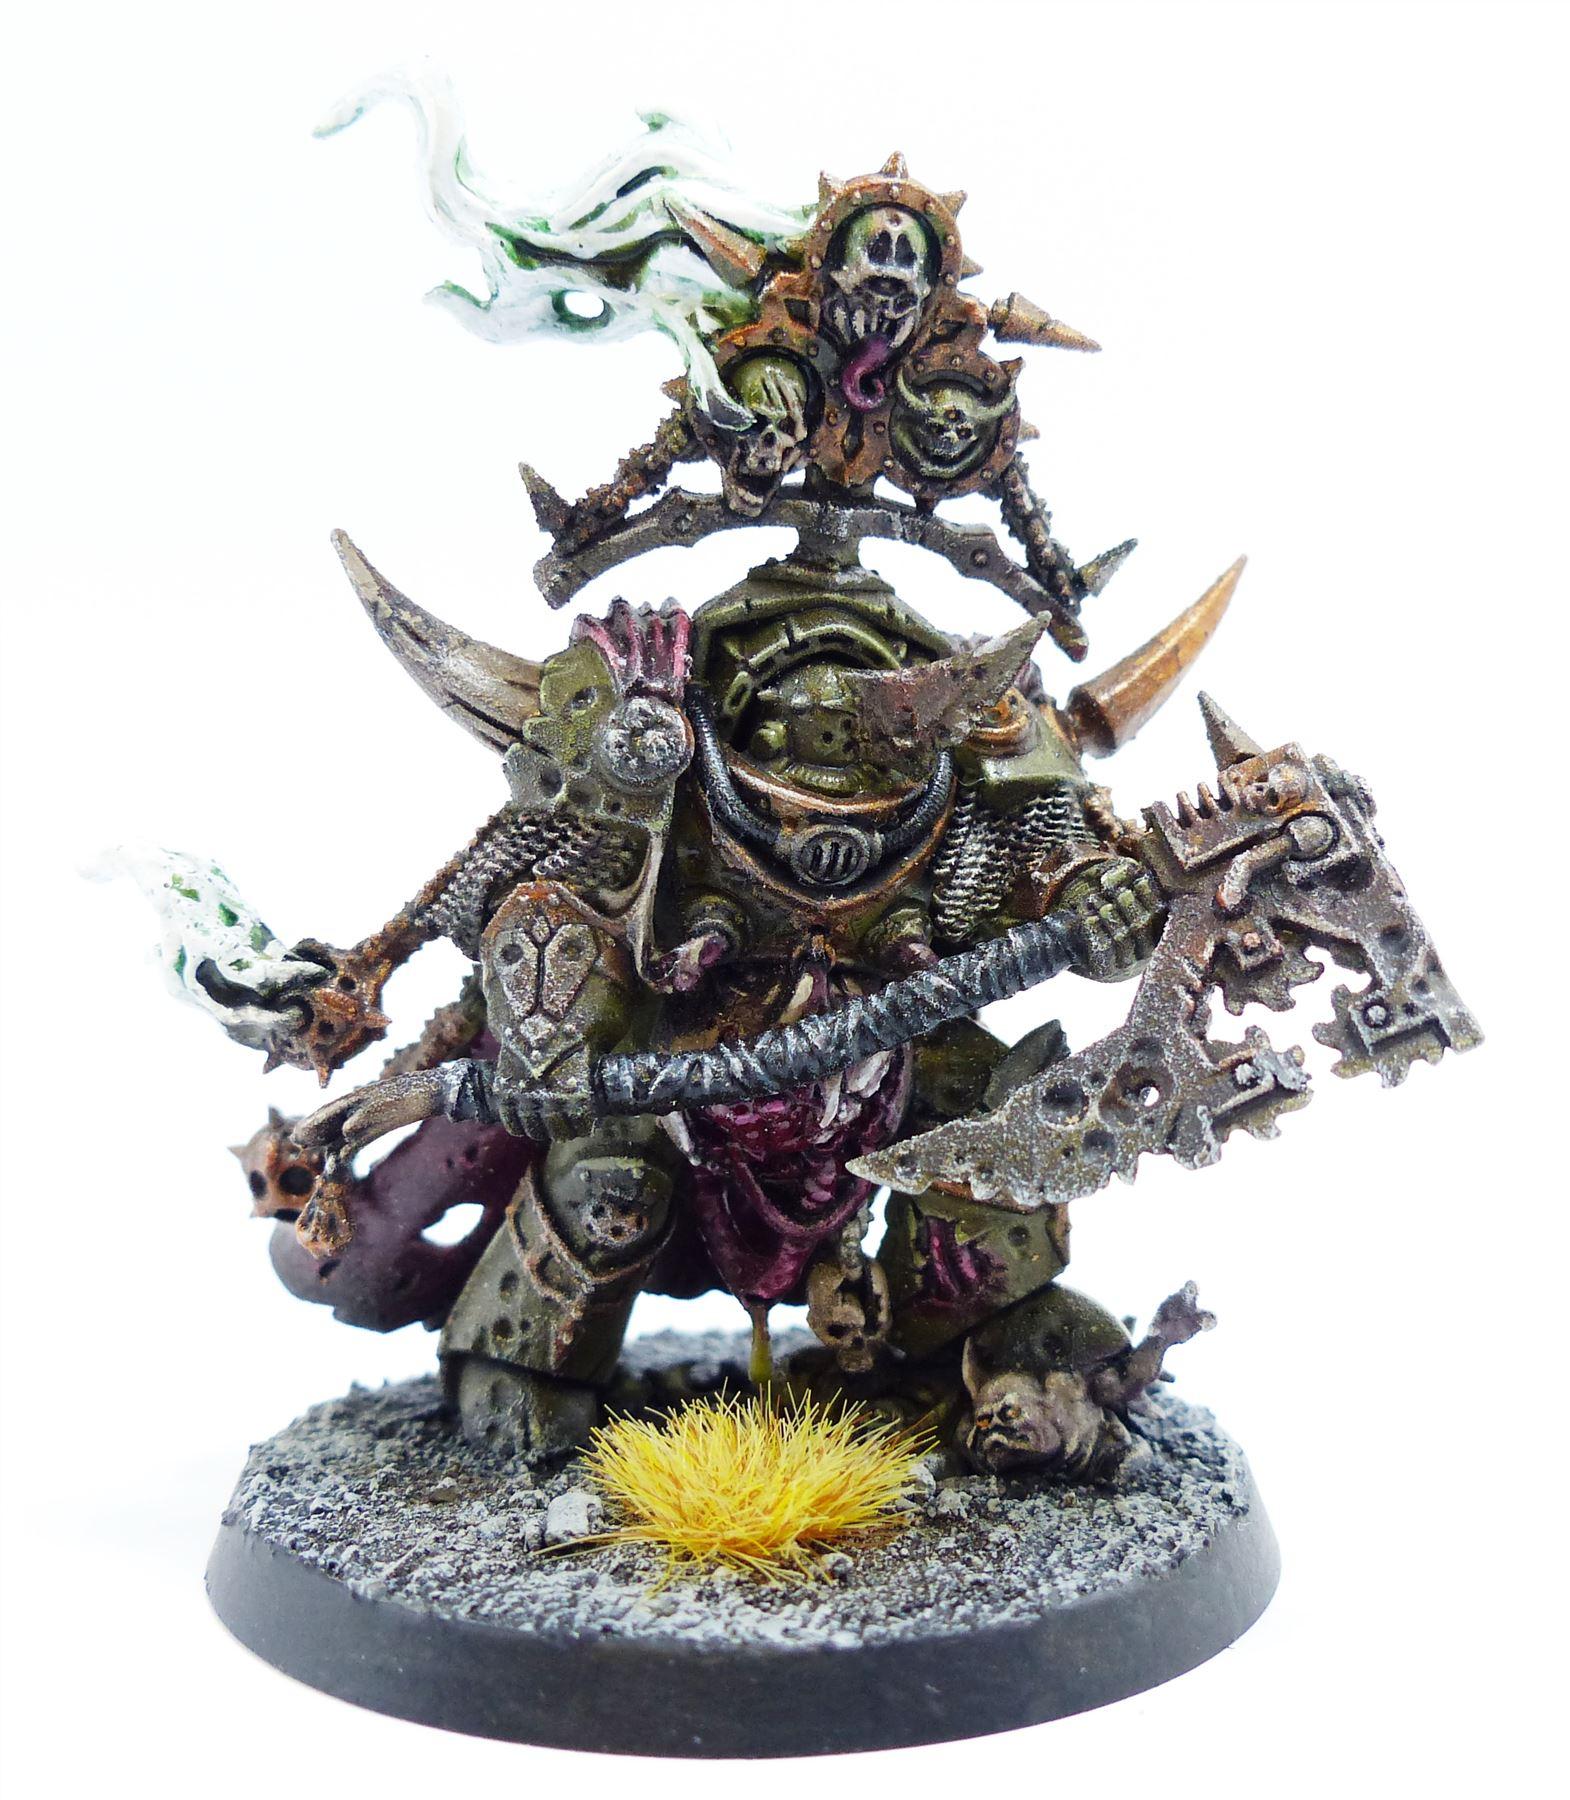 Death Guard - Lord of Contagion - Warhammer I18 I18 I18